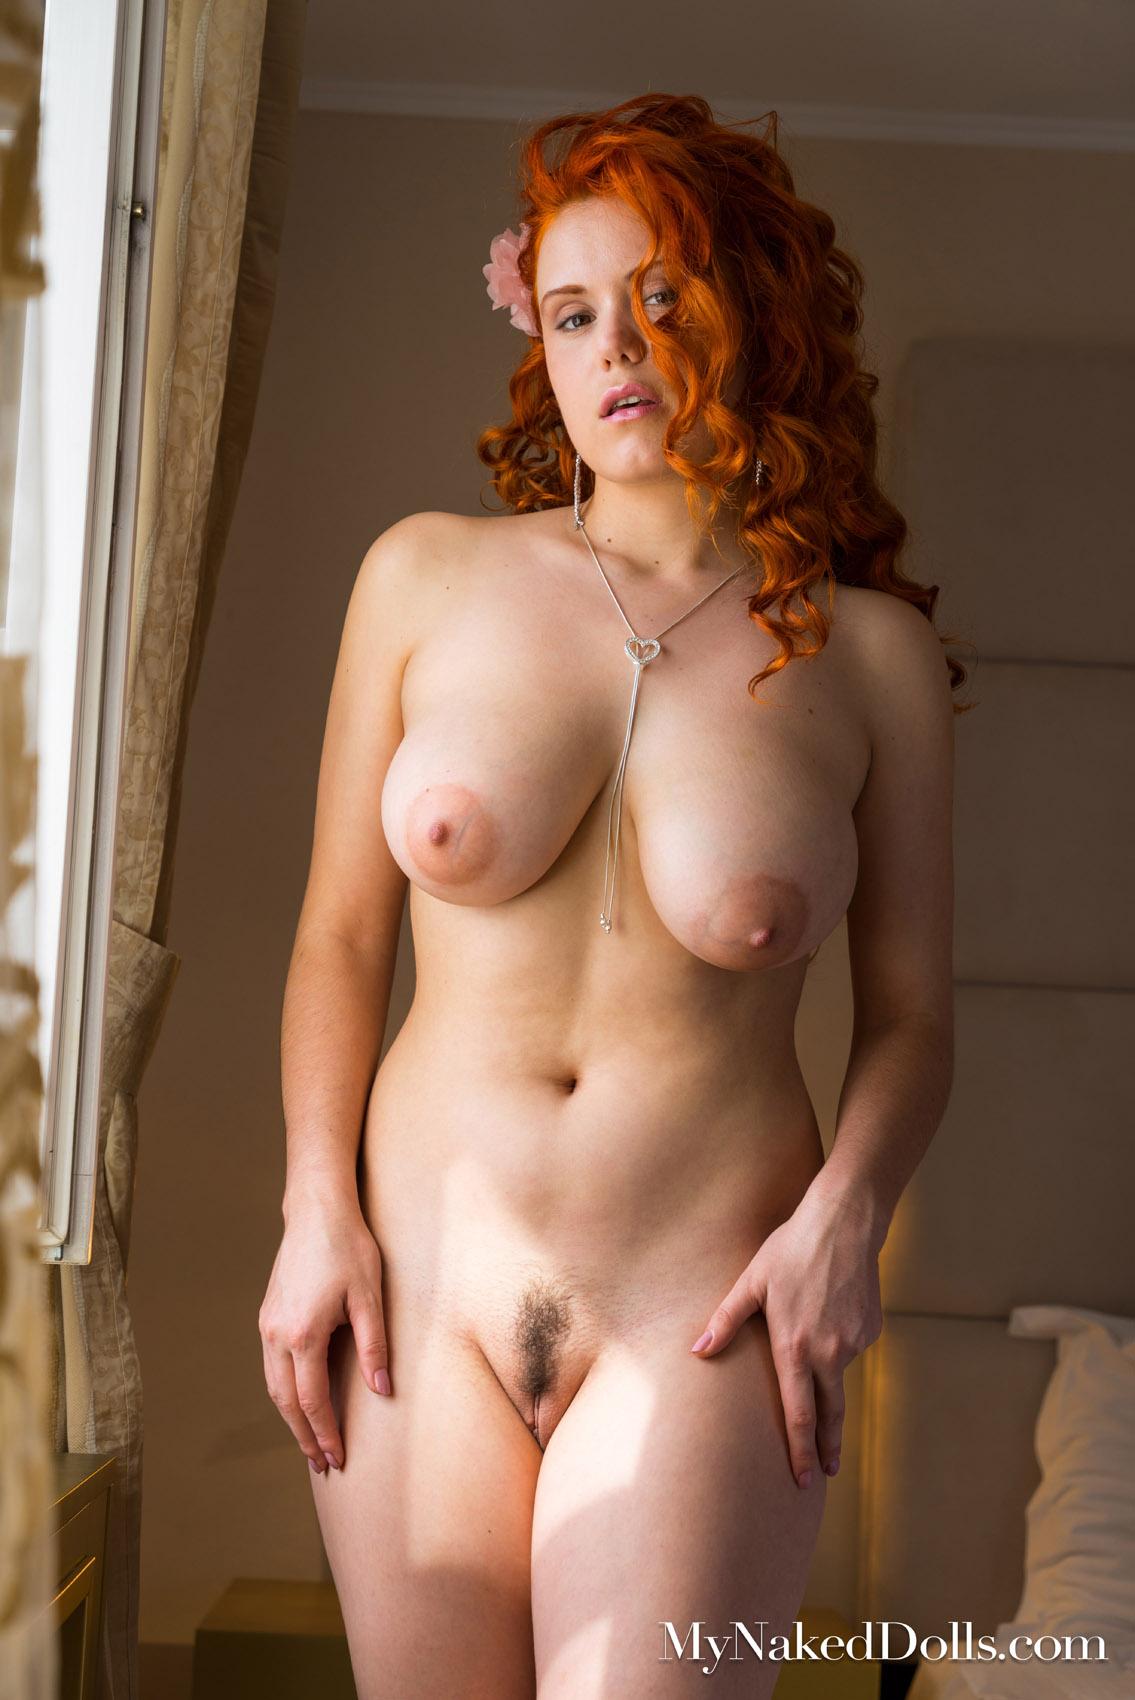 Lillith Von Titz Dream Of Me My Naked Dolls - Curvy Erotic